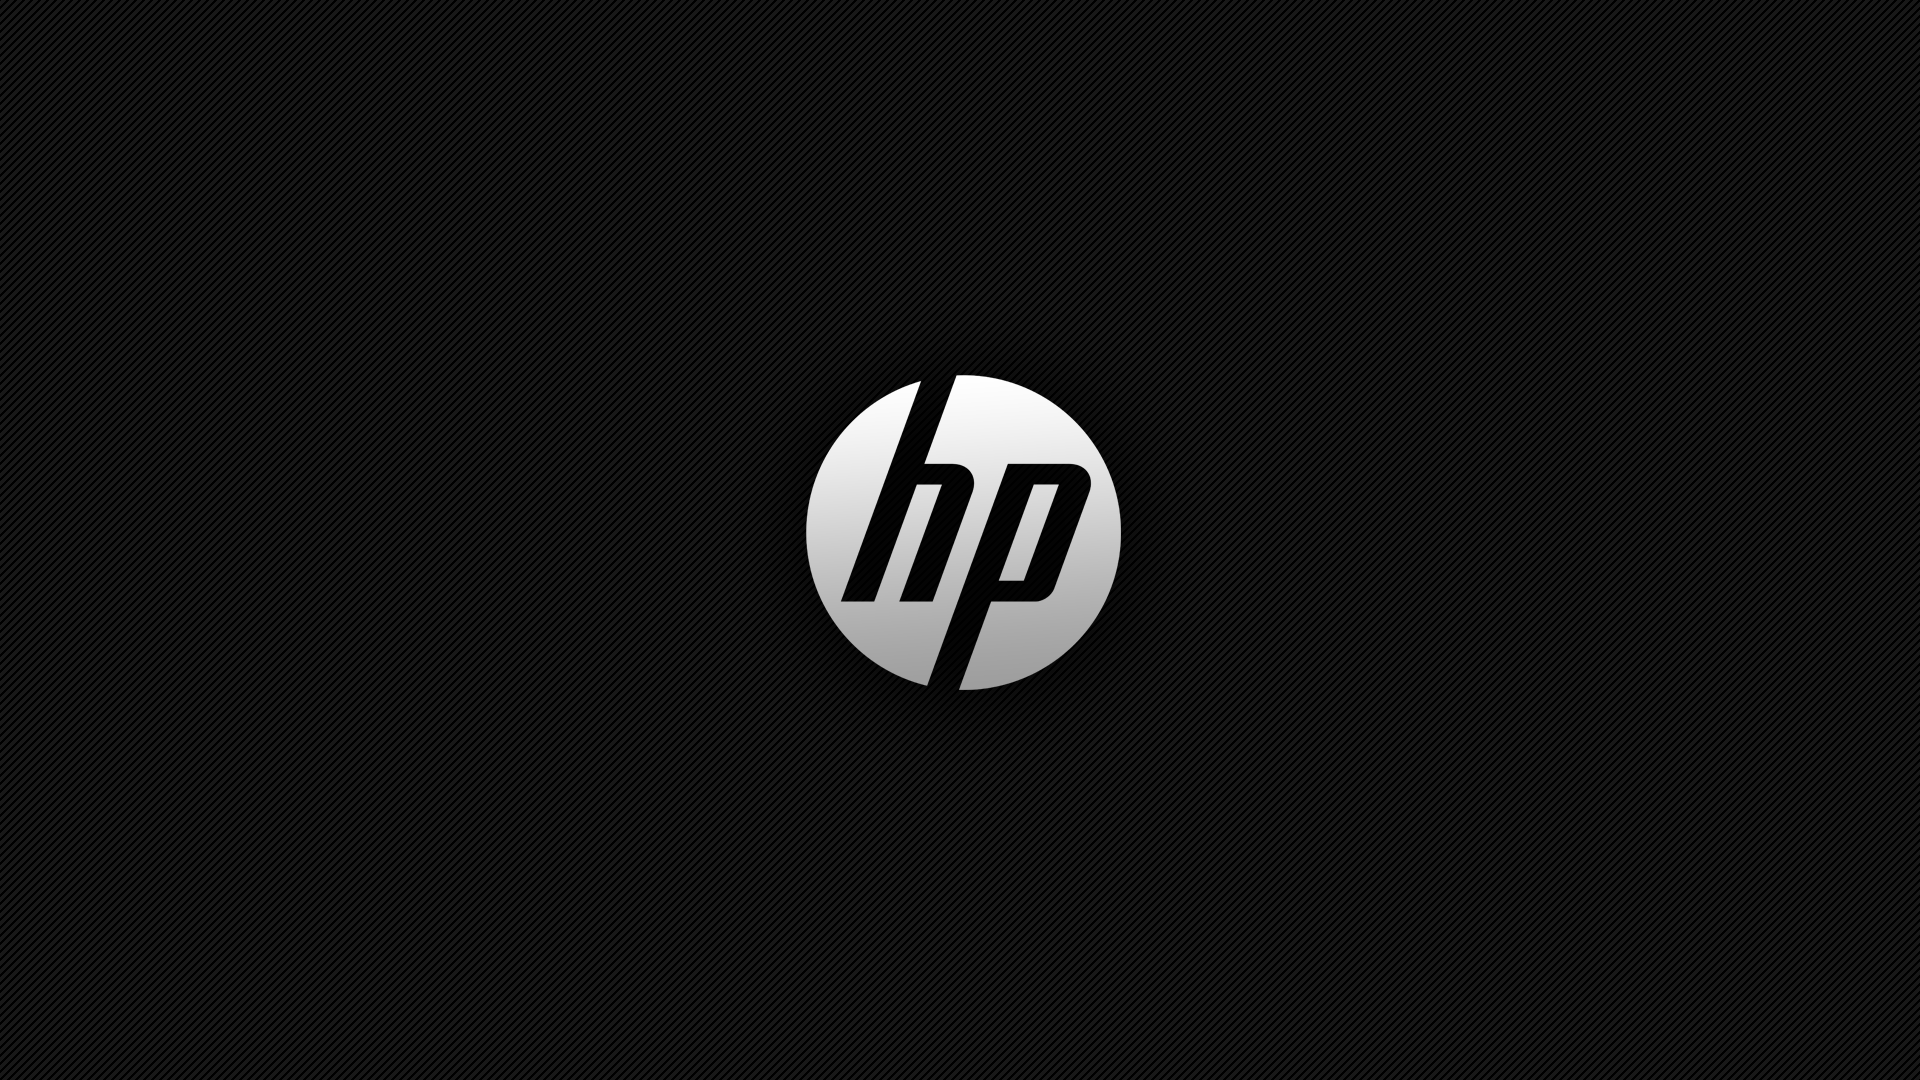 Hp Logo With Dark Background Fond D Ecran Hd Arriere Plan 1920x1080 Id 980571 Wallpaper Abyss